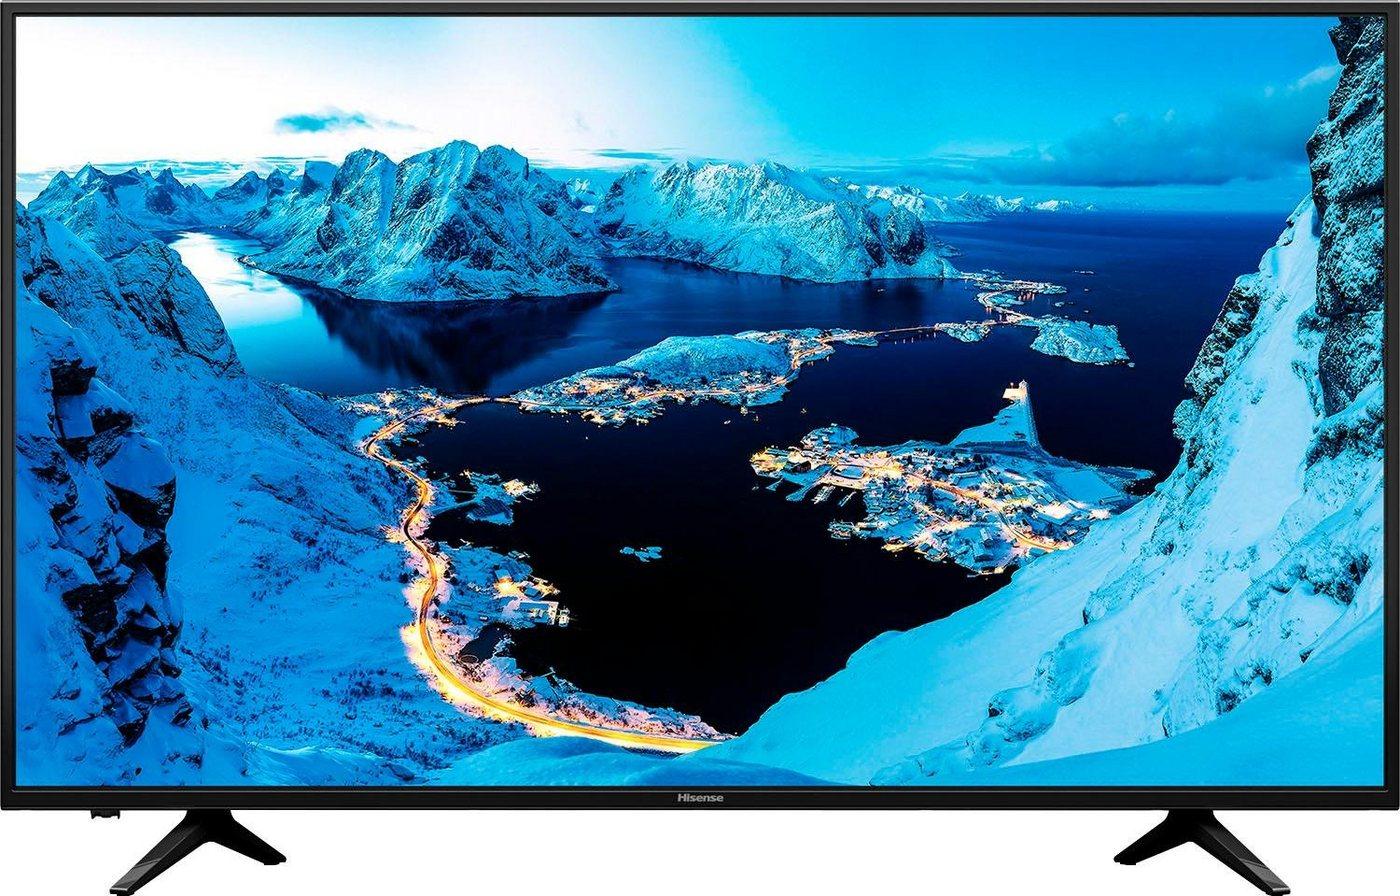 Hisense H65AE6030 LED-Fernseher (163 cm/65 Zoll, 4K Ultra HD, Smart-TV) - Hisense